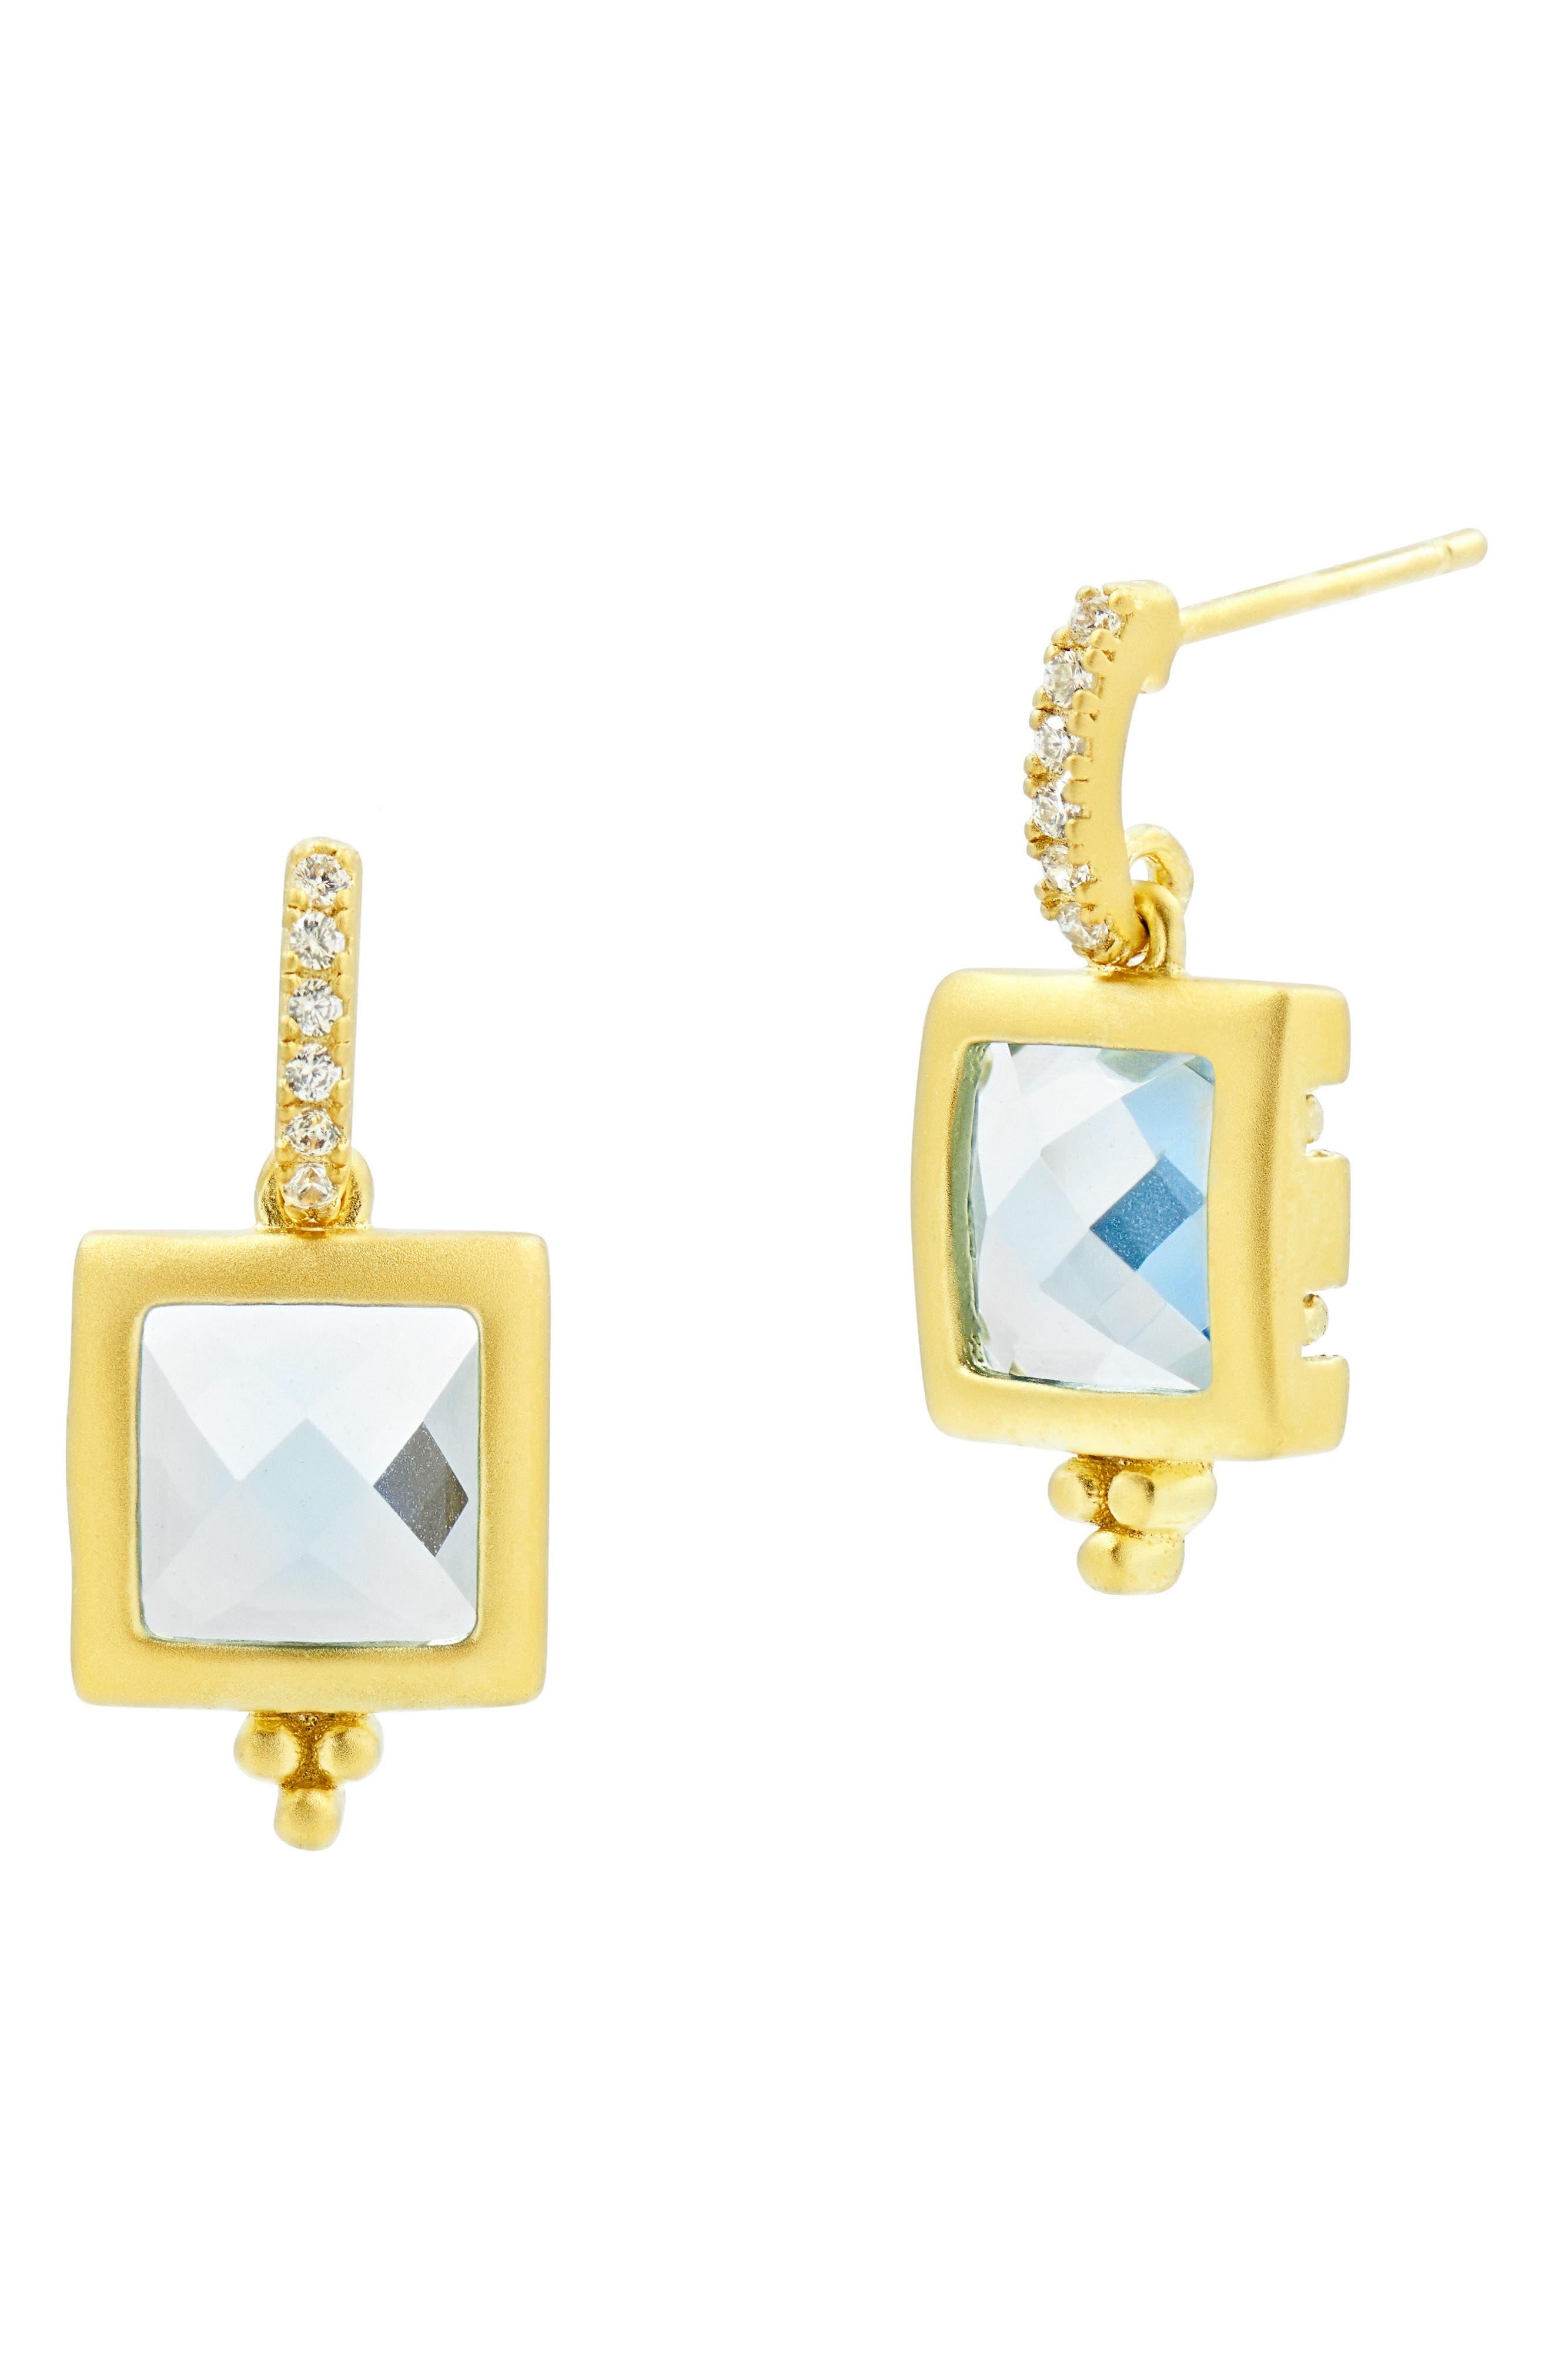 Main Image - FREIDA ROTHMAN Ocean Azure Cubic Zirconia Stud Earrings